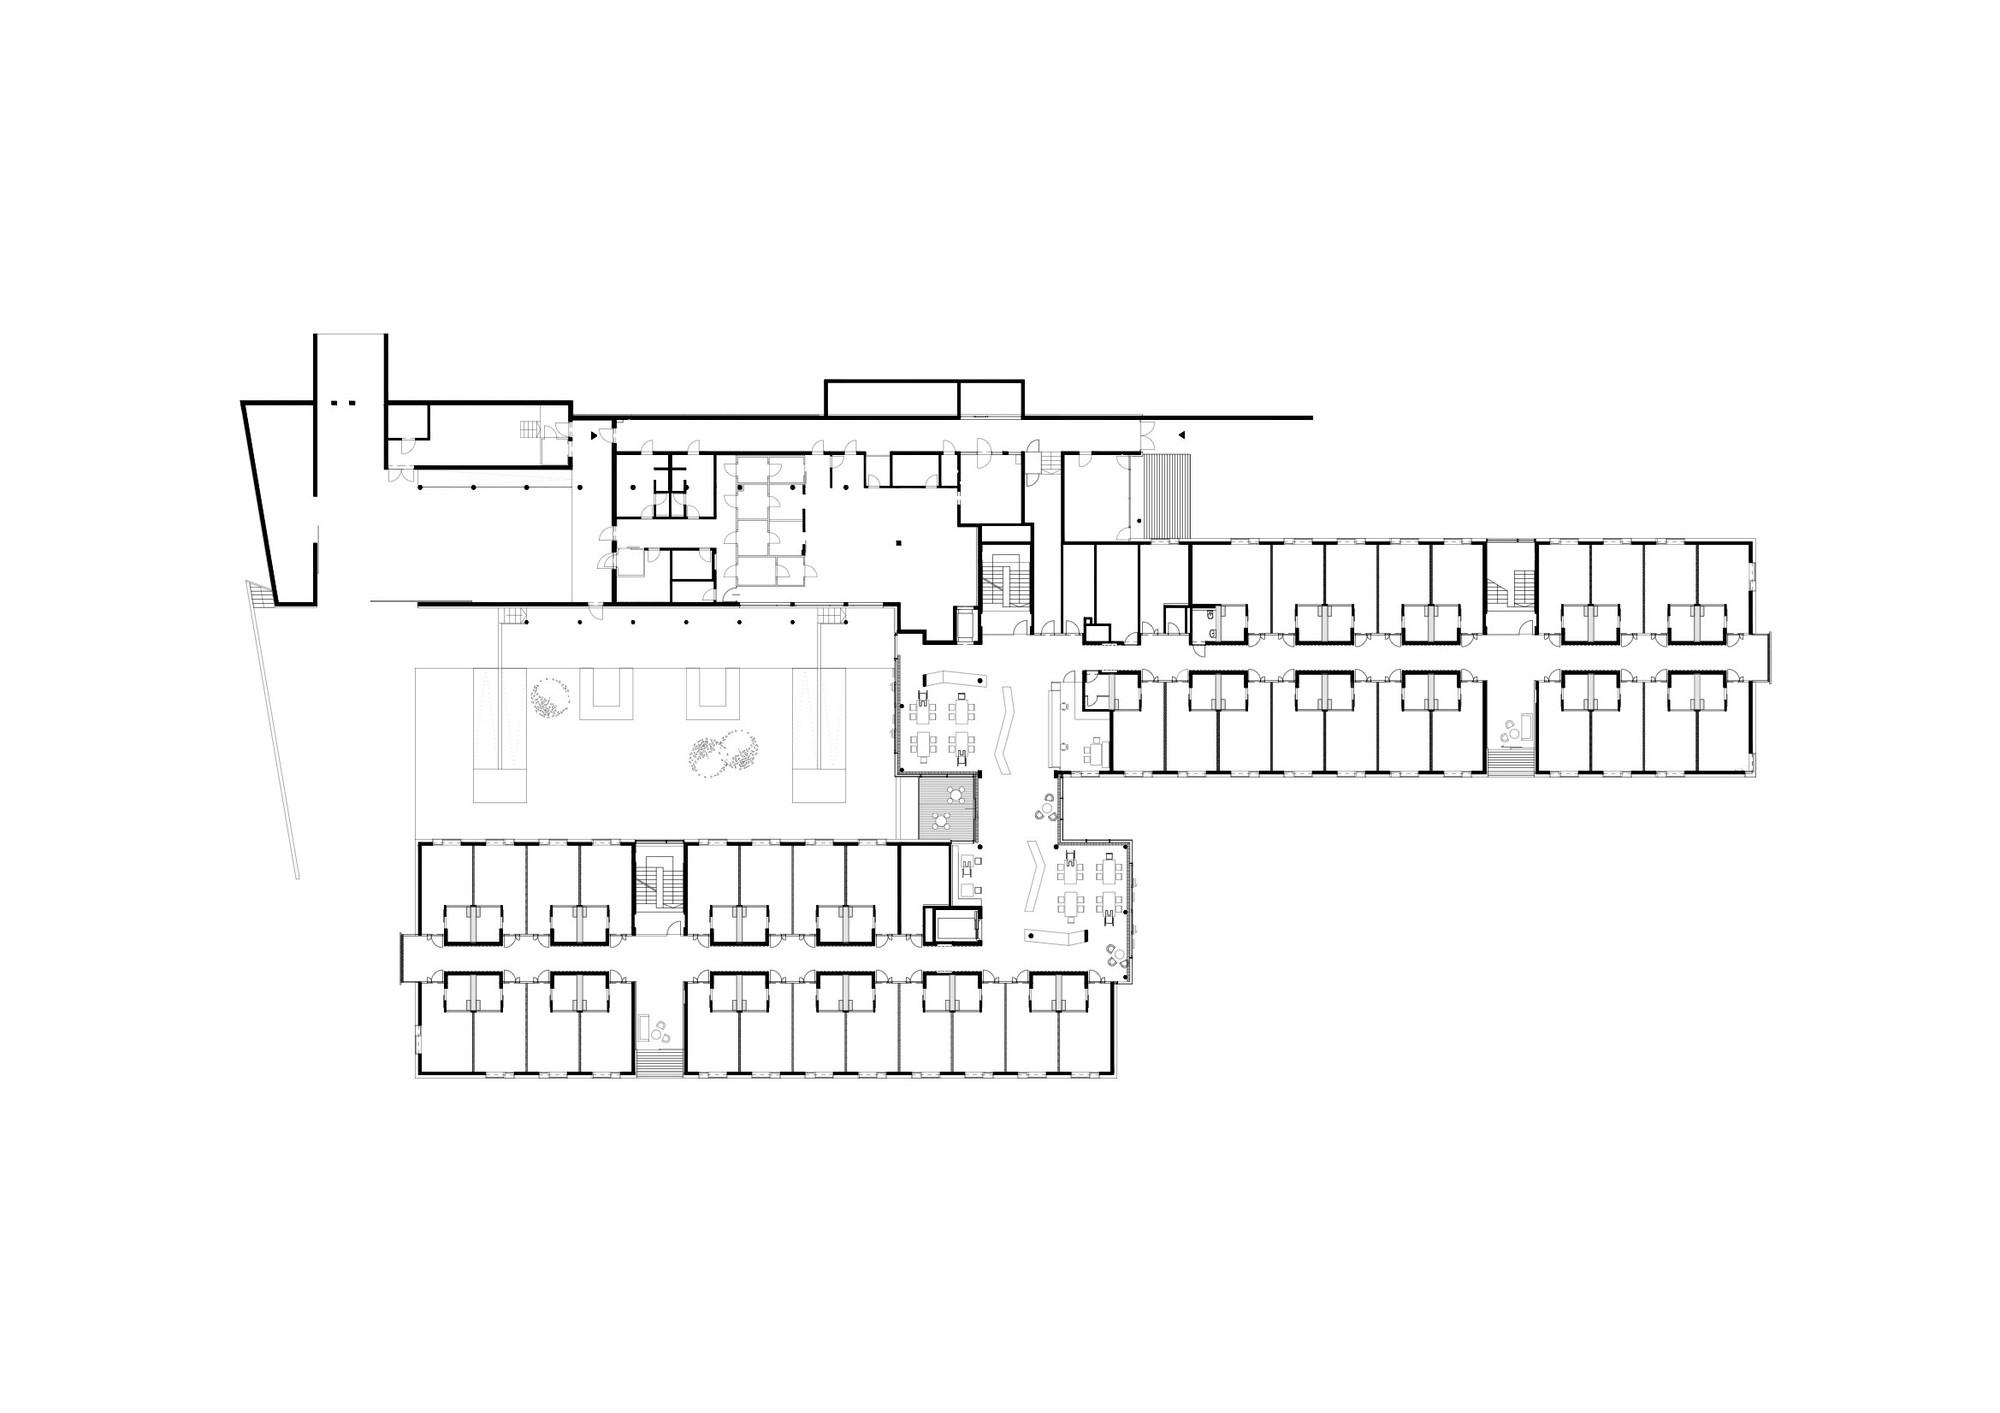 gallery of nursing home gartner neururer 13 floor plan